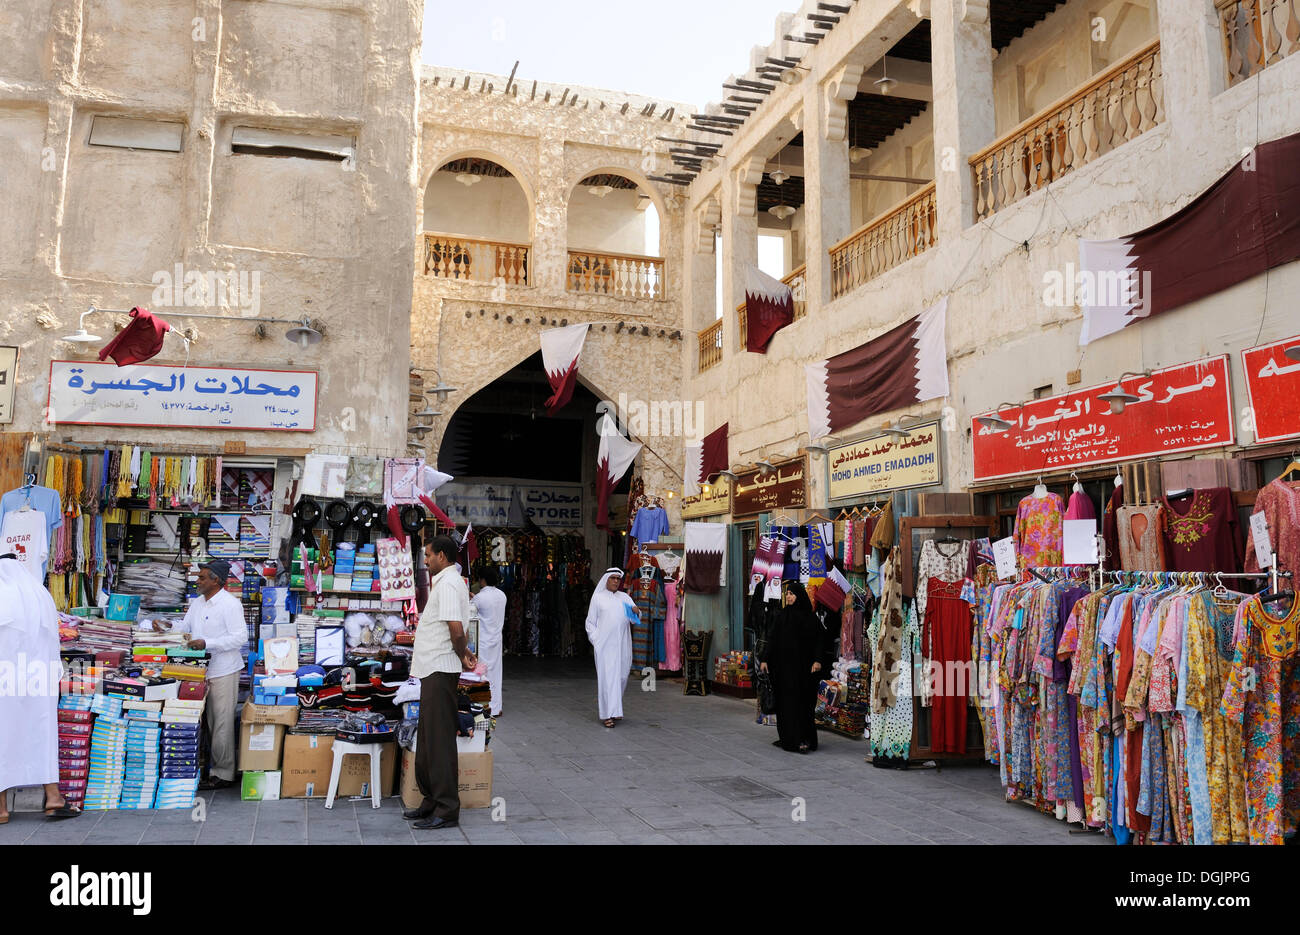 Merchants in Souq al Waqif, the oldest souq or bazaar in the country, Doha, Qatar, Arabian Peninsula, Persian Gulf, Middle East - Stock Image